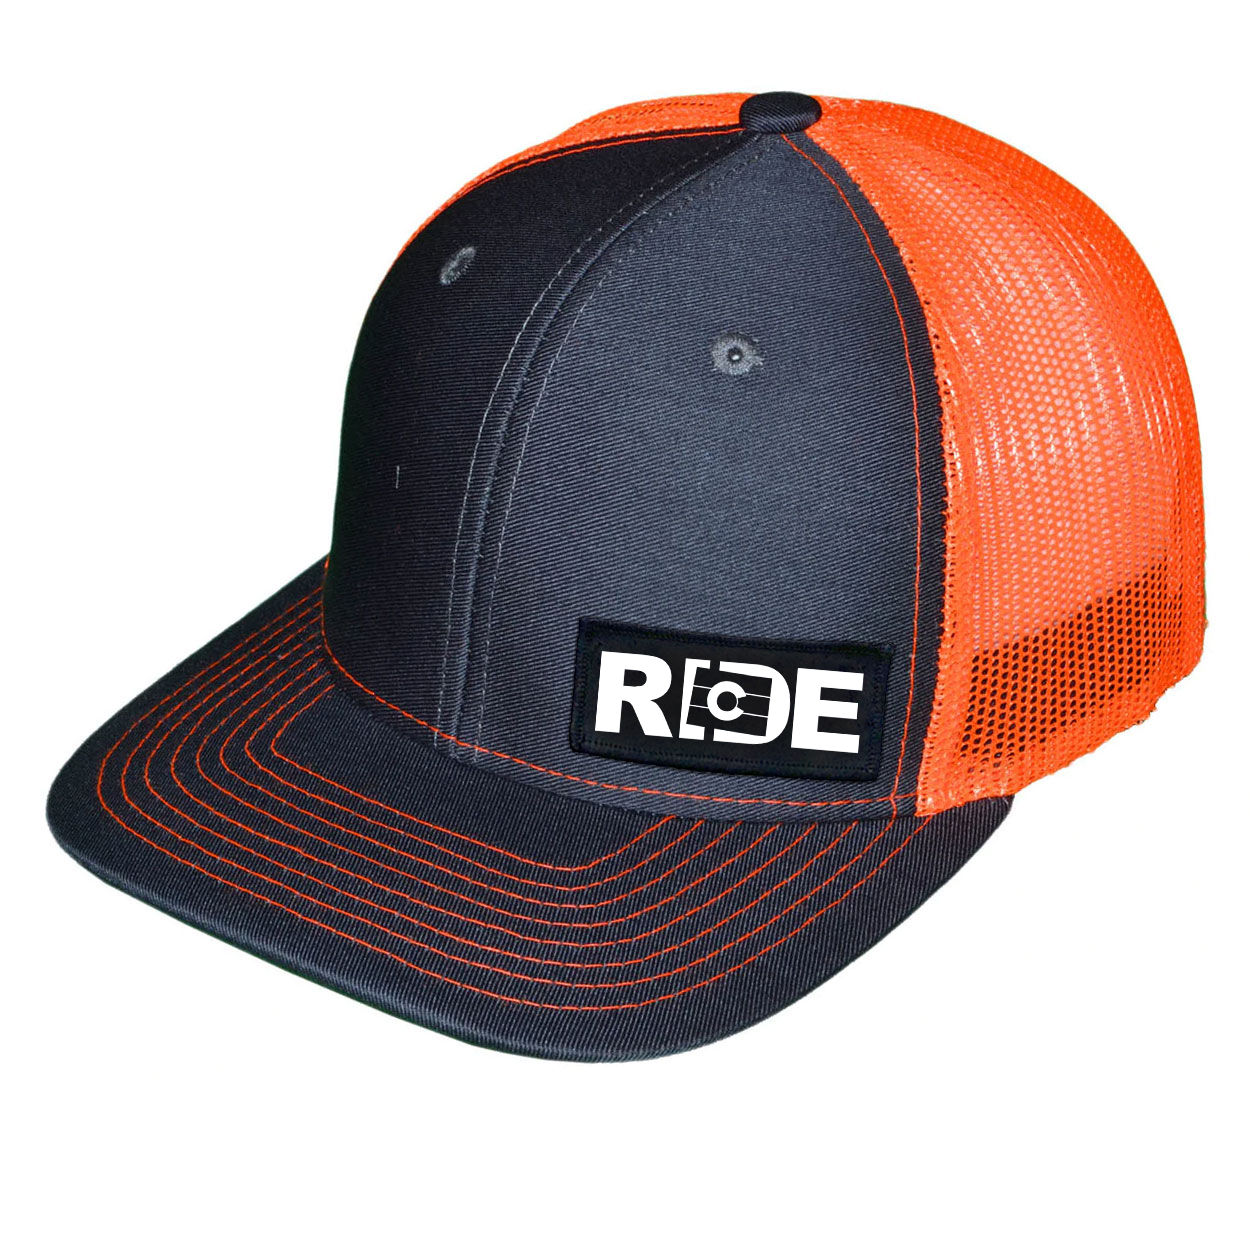 Ride Colorado Night Out Woven Patch Snapback Trucker Hat Dark Gray/Orange (White Logo)